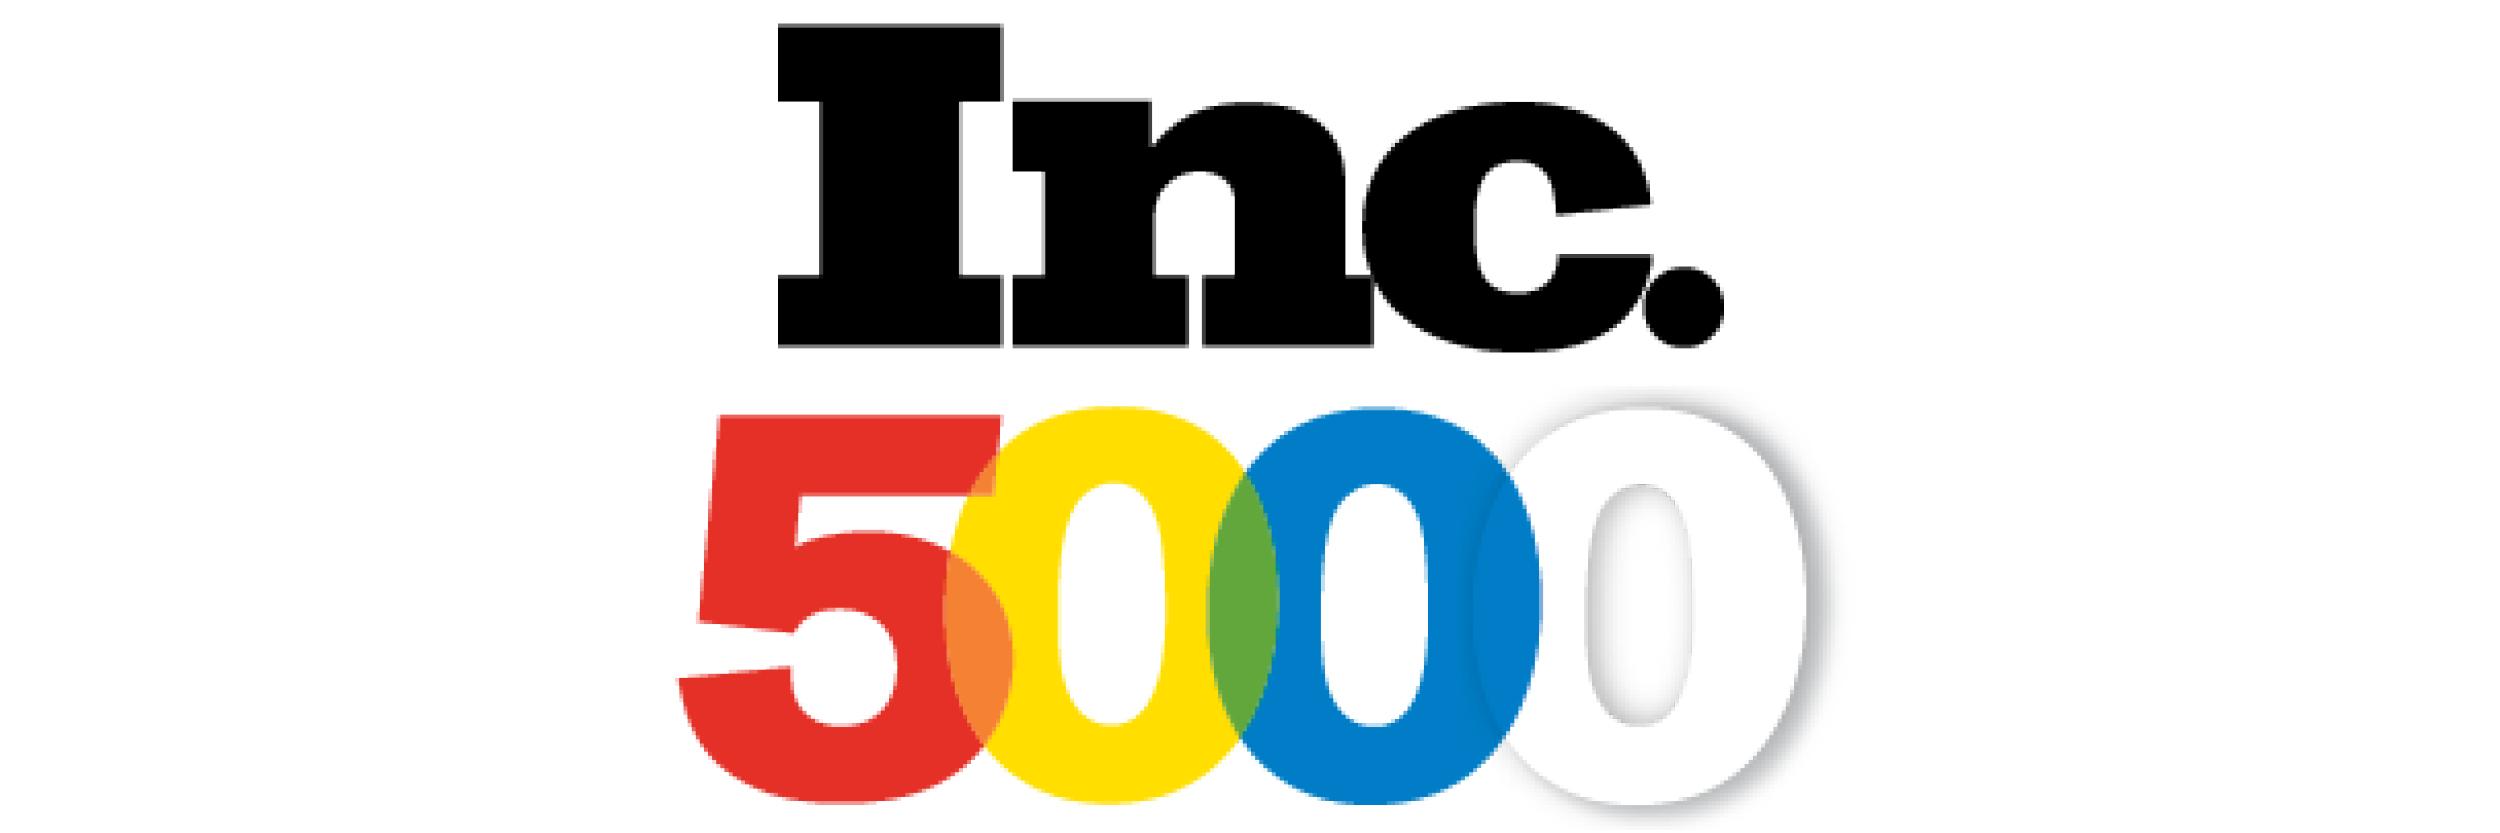 Inc 5000 - 600x200